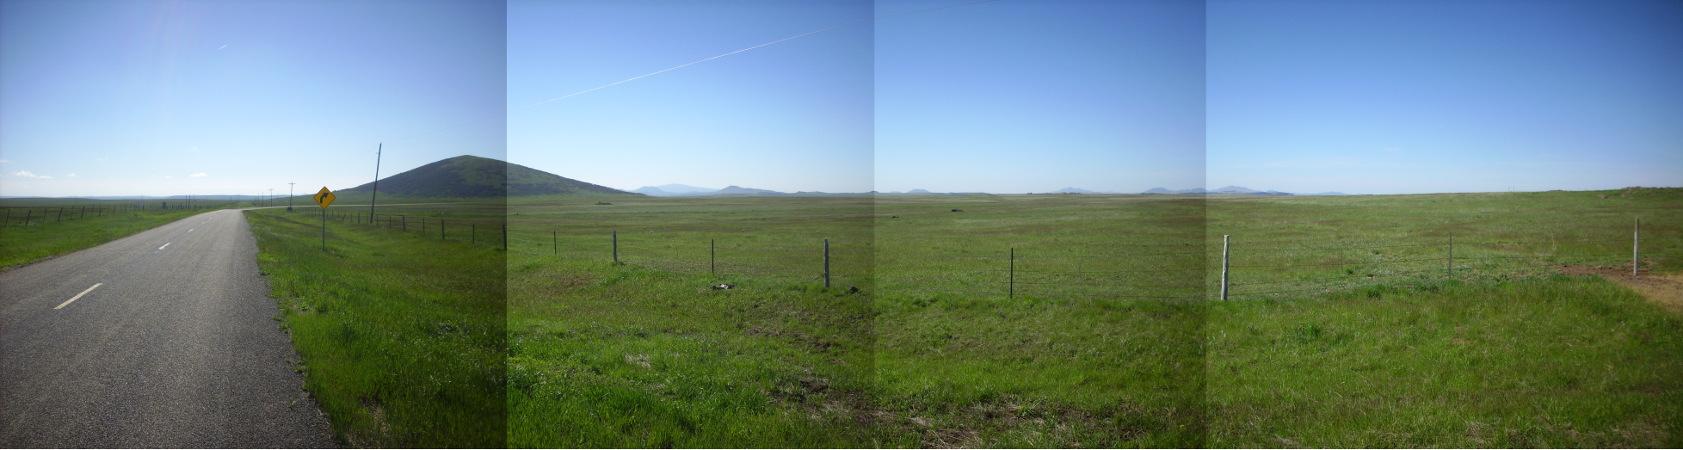 Raton-Clayton volcanic field panorama